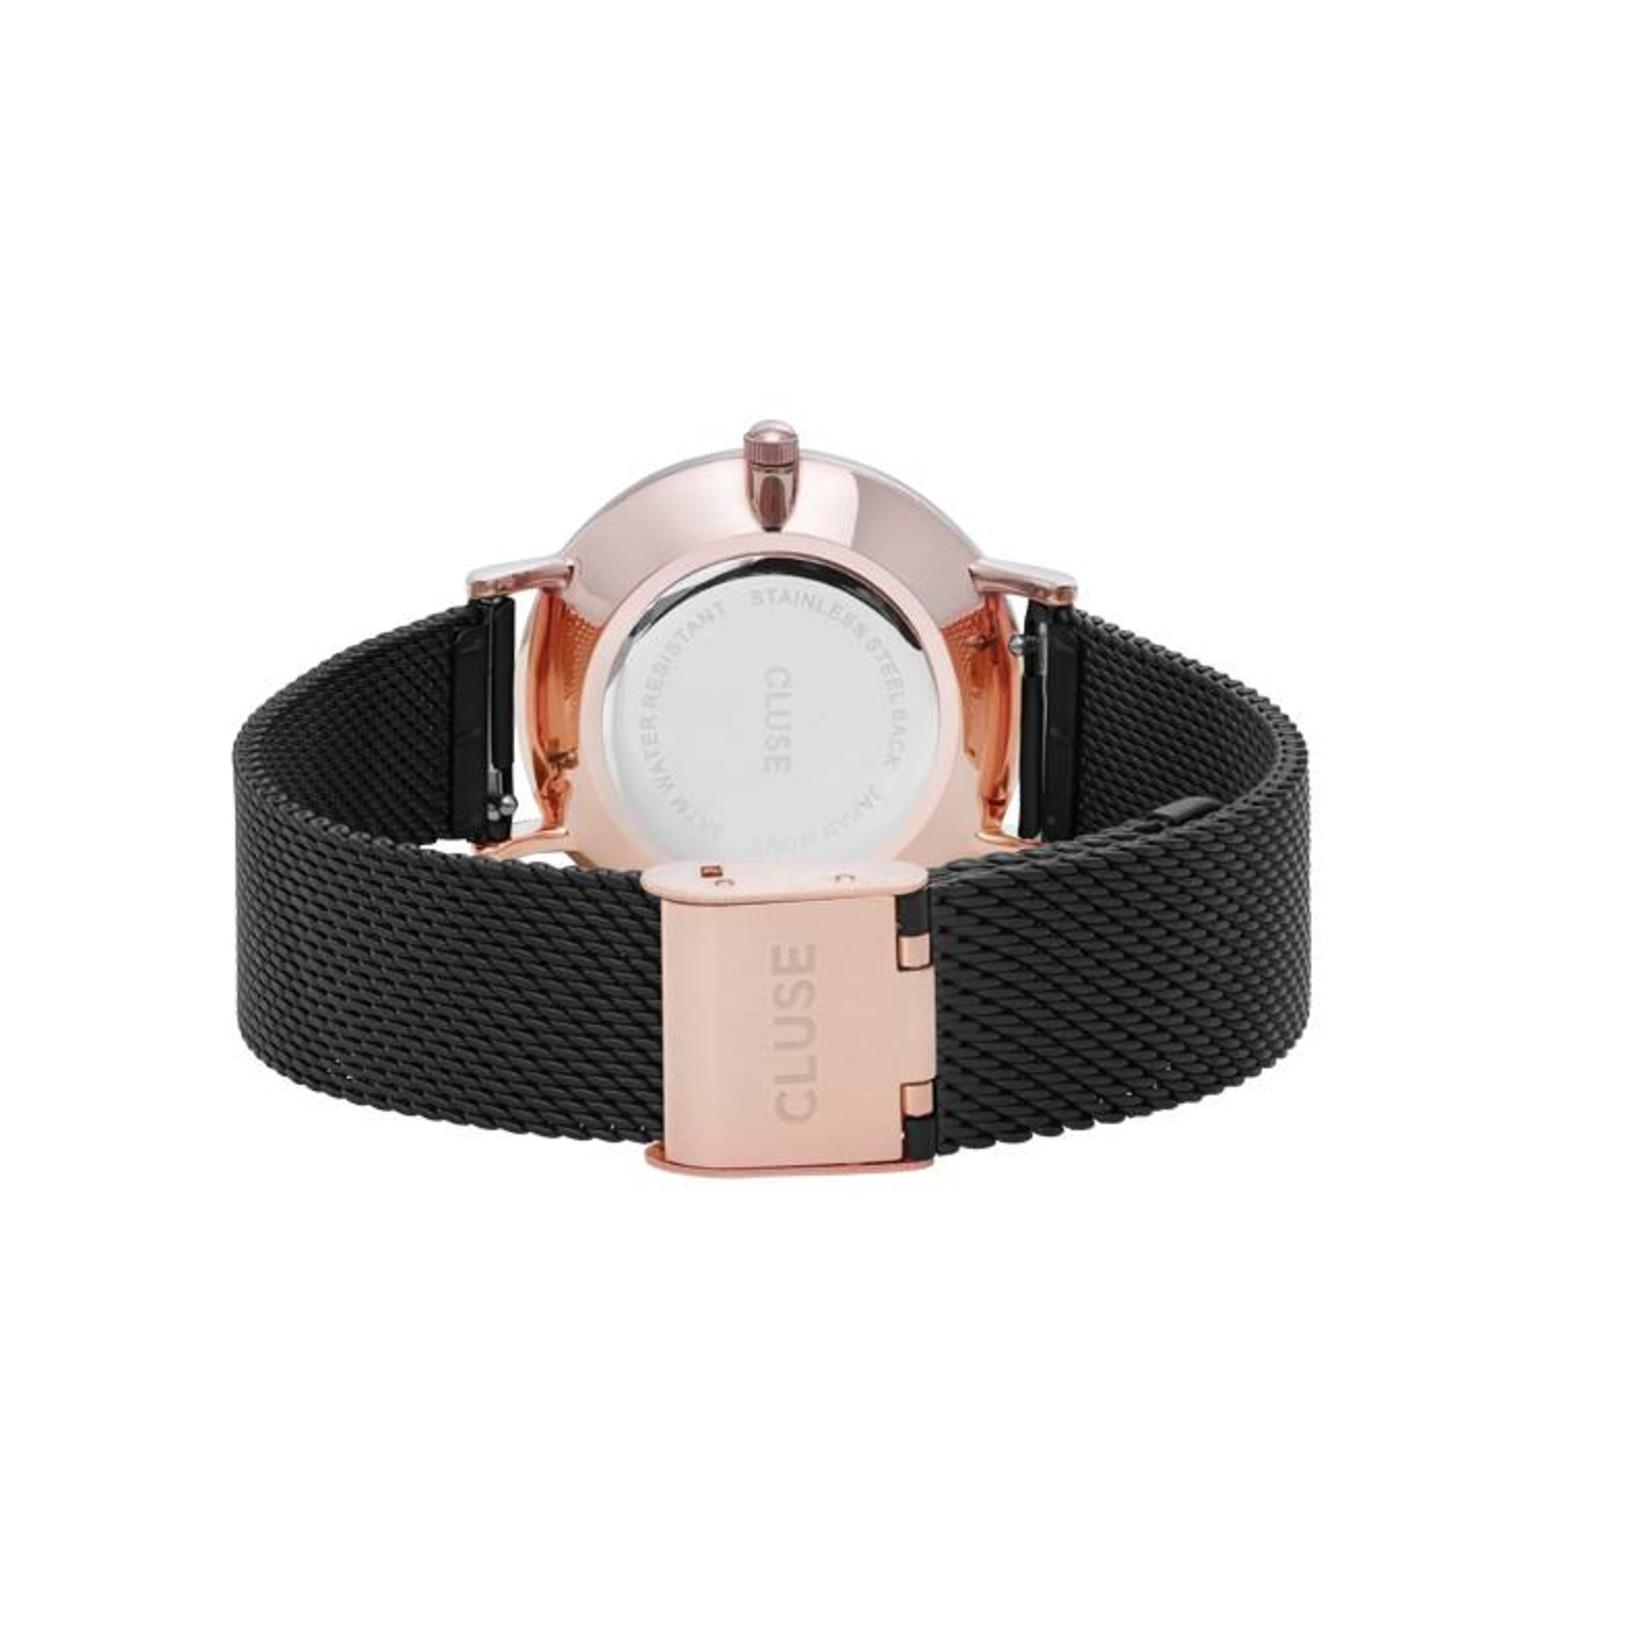 Cluse Cluse Uhr Miniuit roségold-schwarz I Mesh schwarz